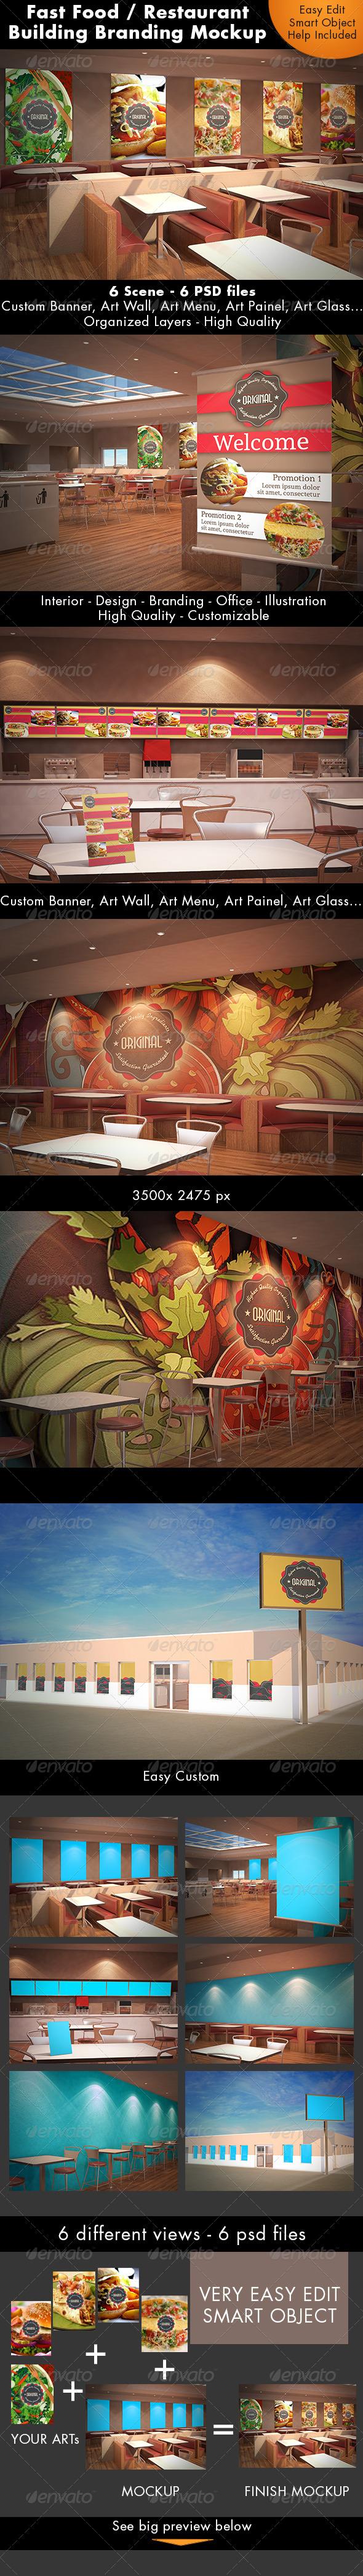 GraphicRiver Fast Food Building Branding Mockup 7424775